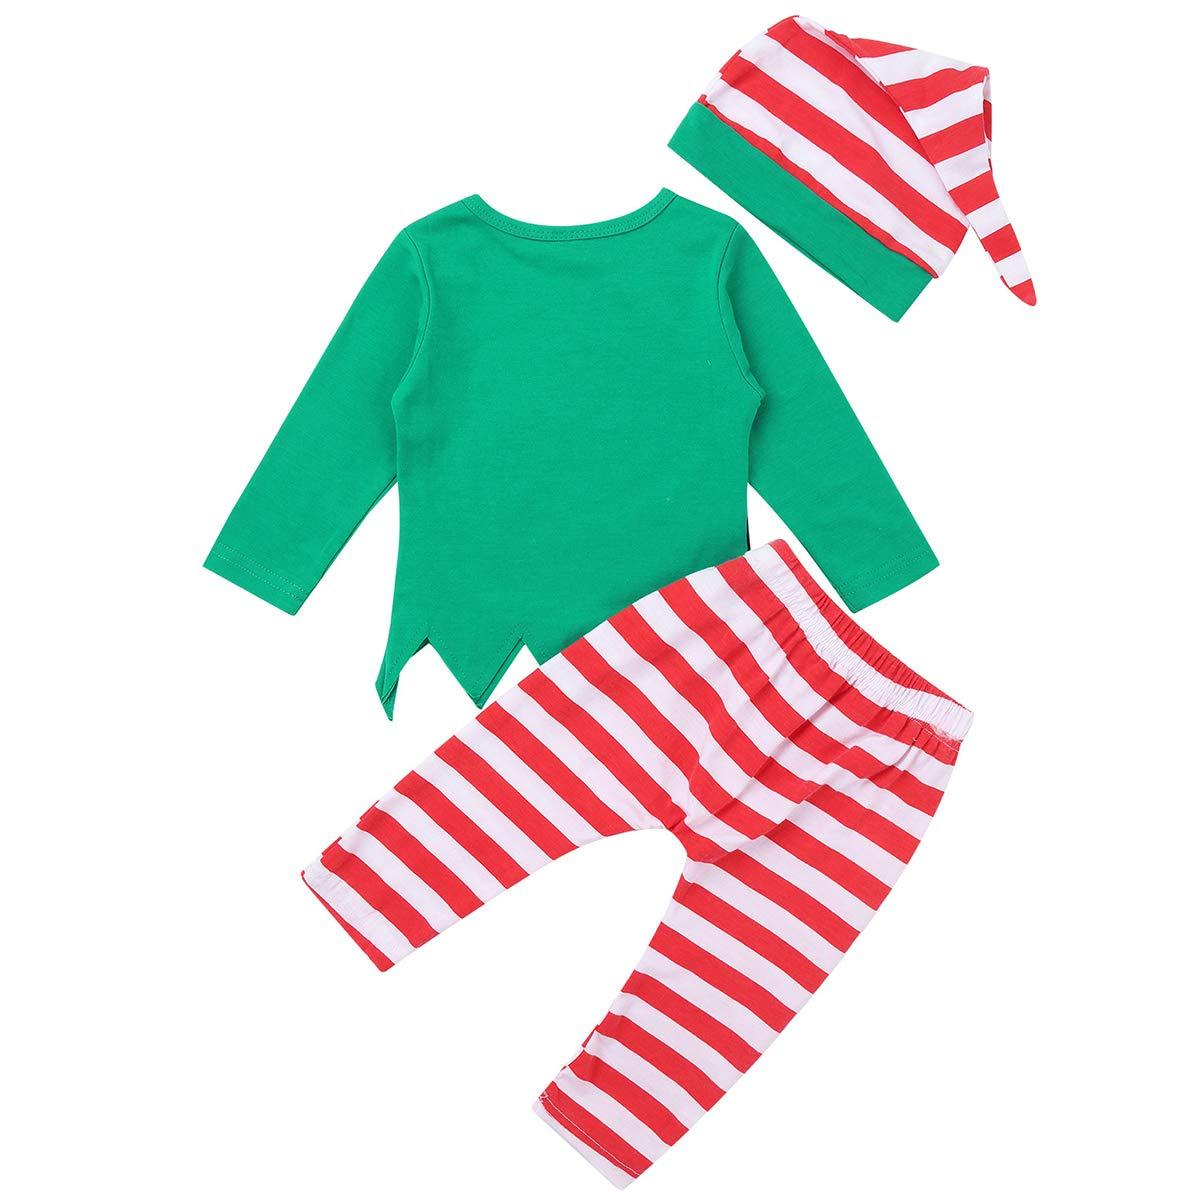 Freebily Ropa Conjunto Beb/é Ni/ña Ni/ño Recien Nacido Elfo Disfraz de Duende Beb/é Navidad Camisa Top Manga Larga con Pantal/ón Rayada Gorro de Santa